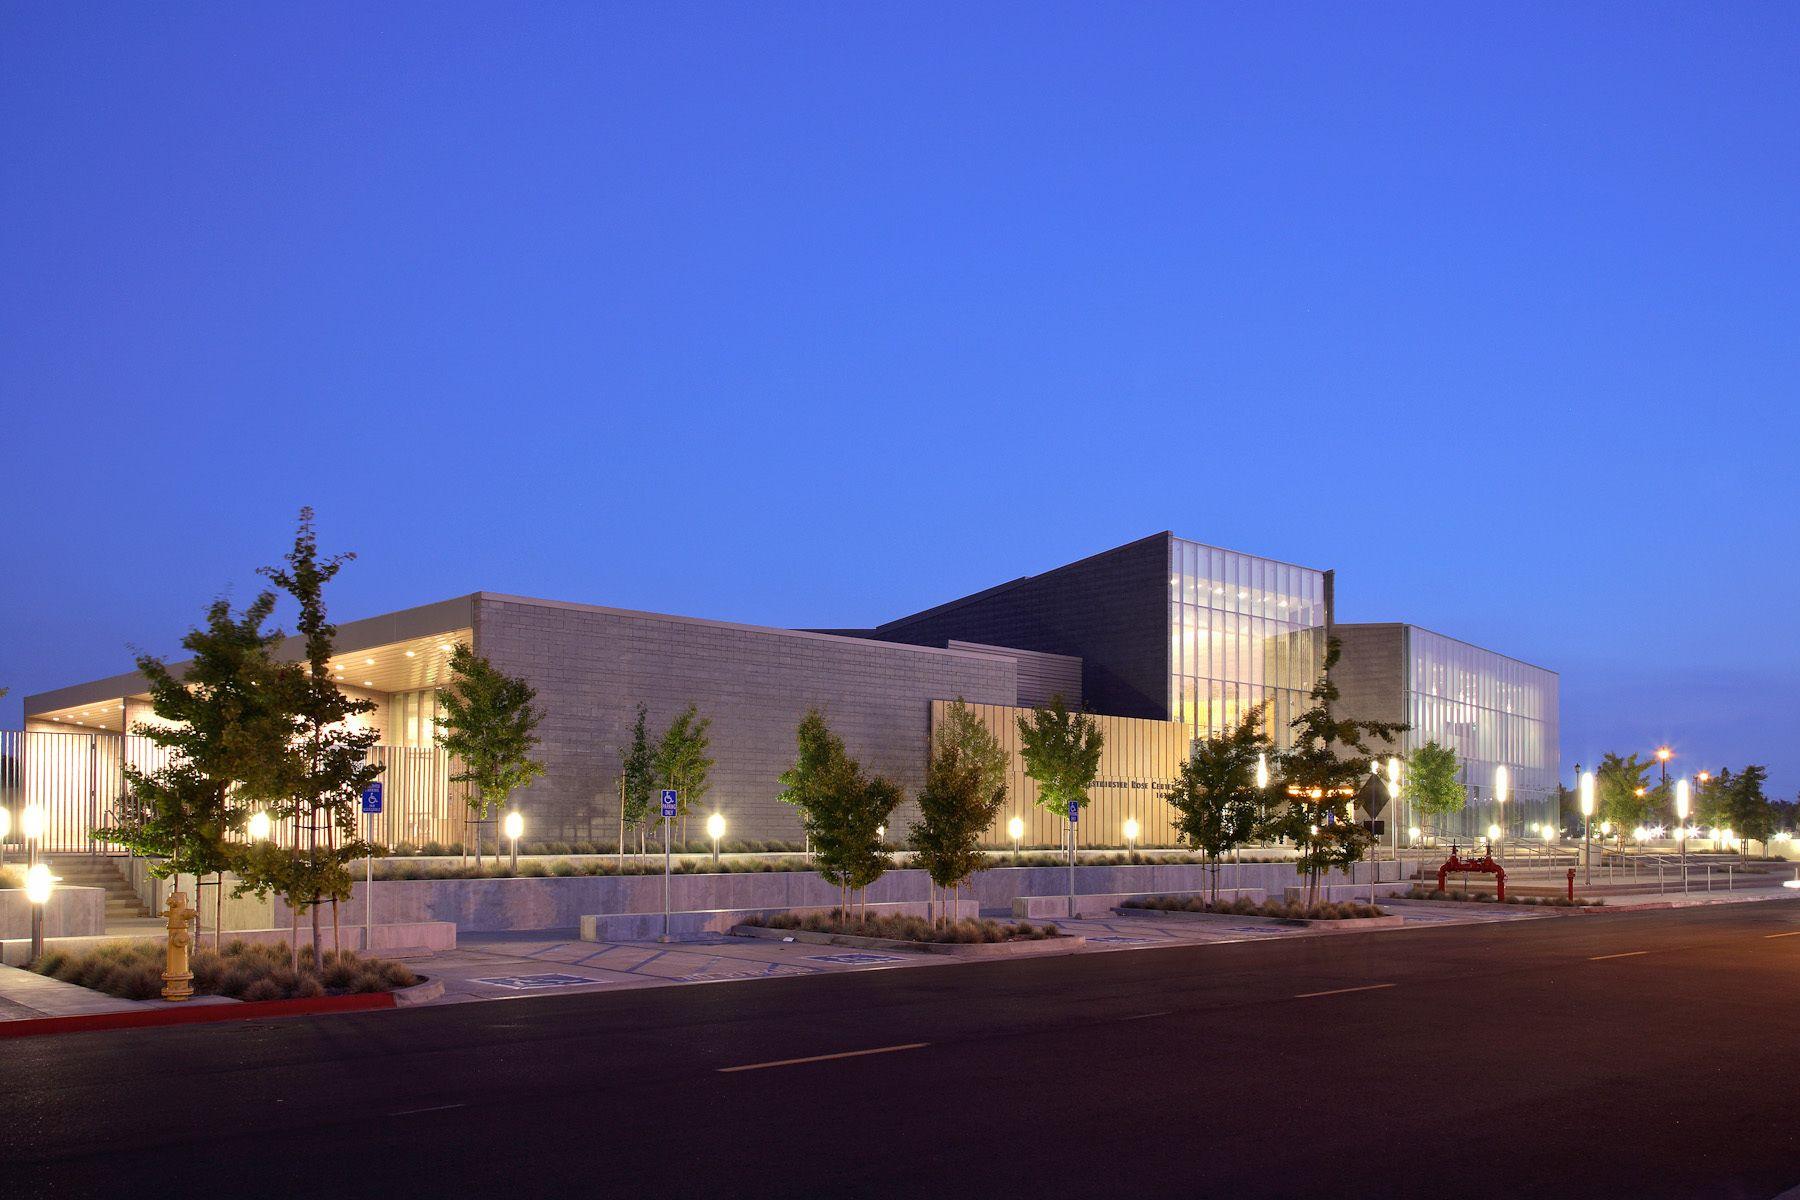 Rose Center Performing Arts